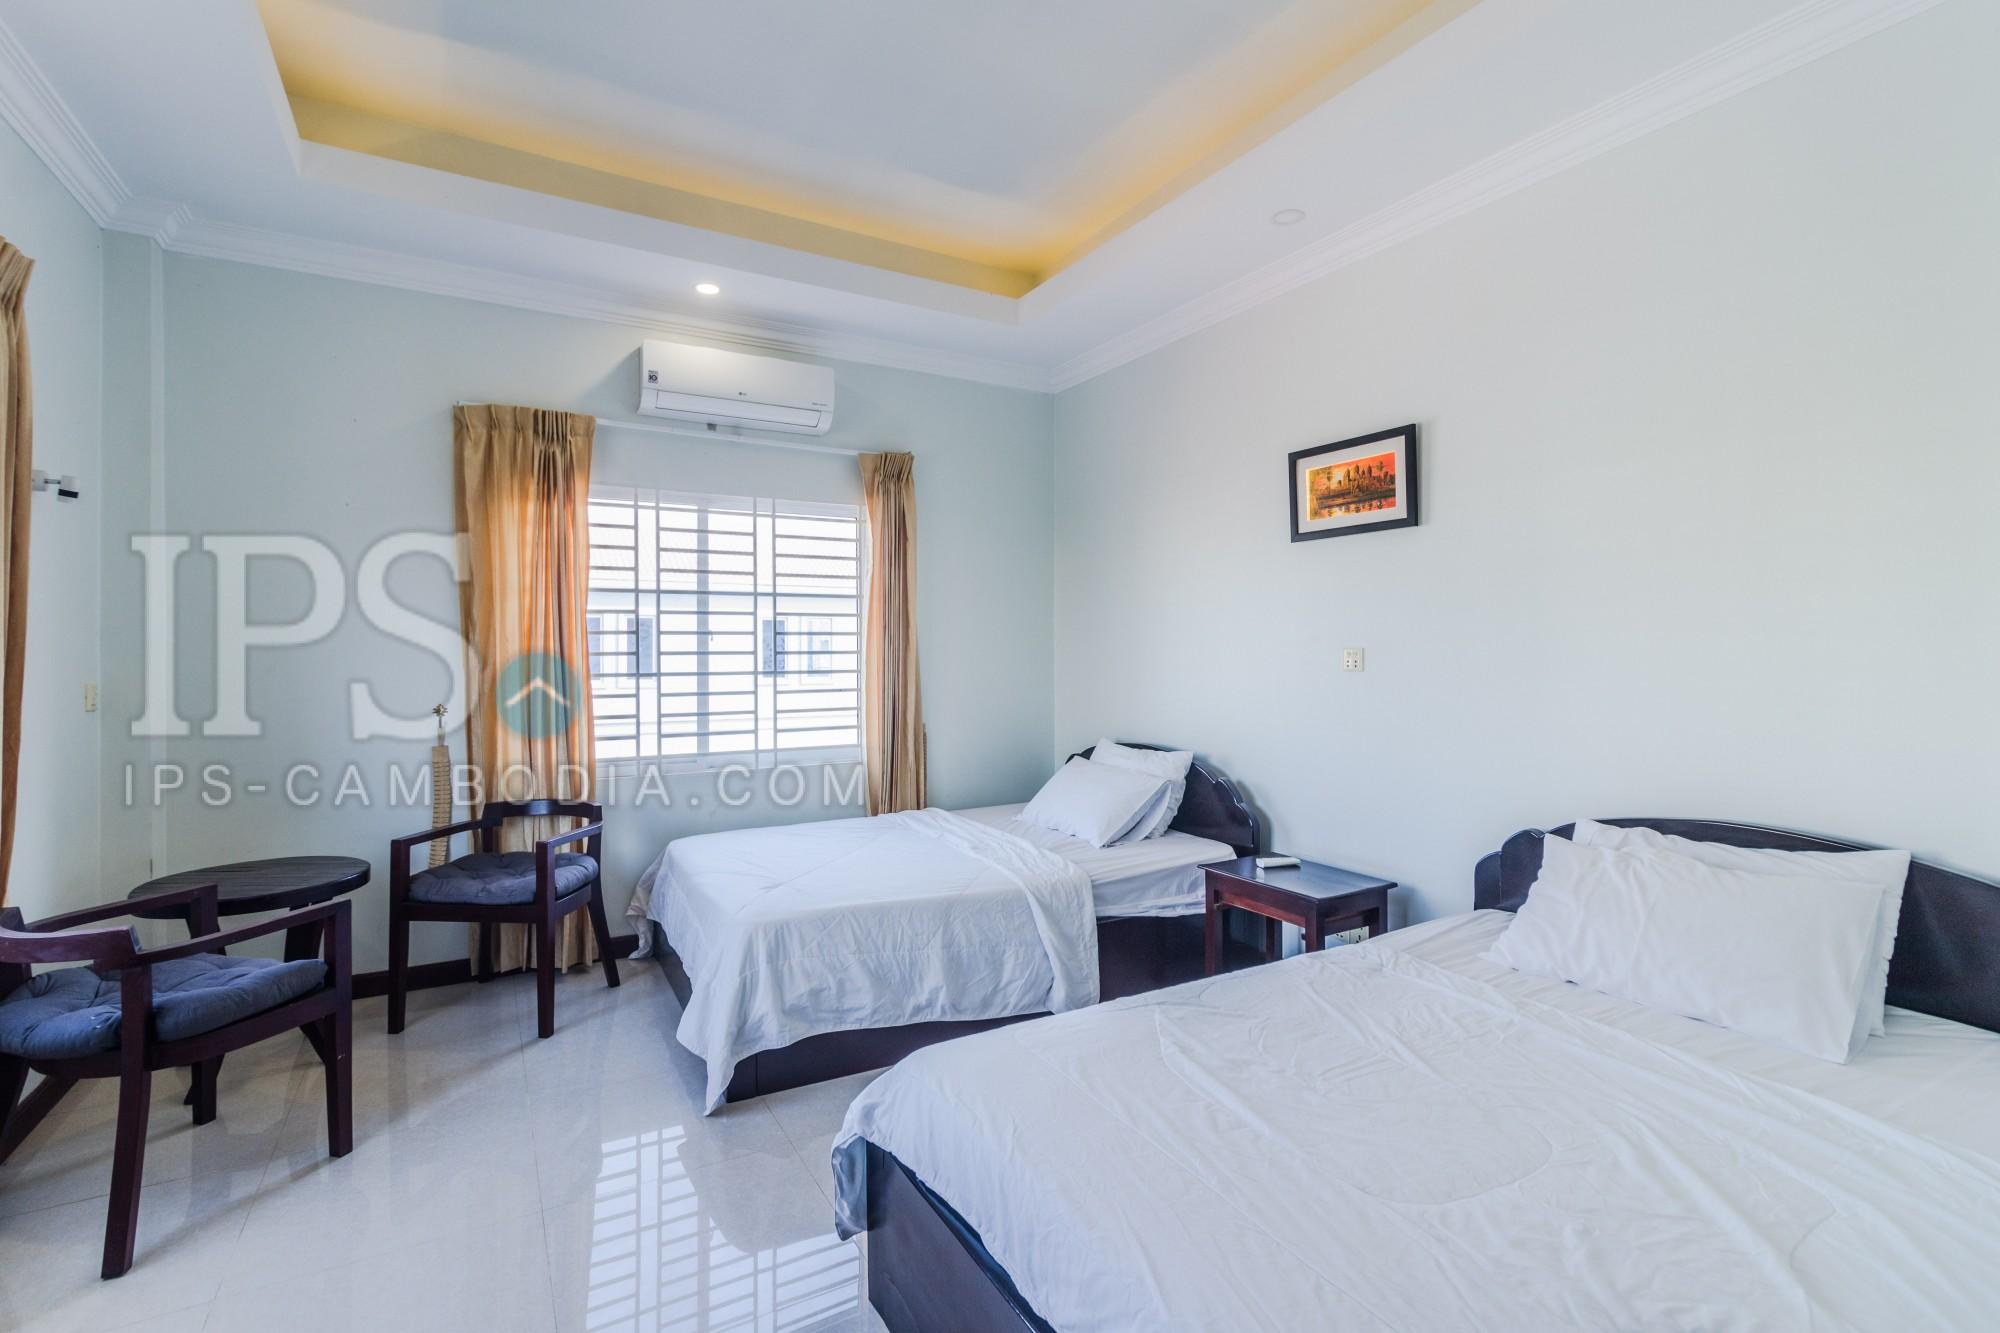 13 Bedroom Villa Hotel For Rent - Svay Dangkum, Siem Reap